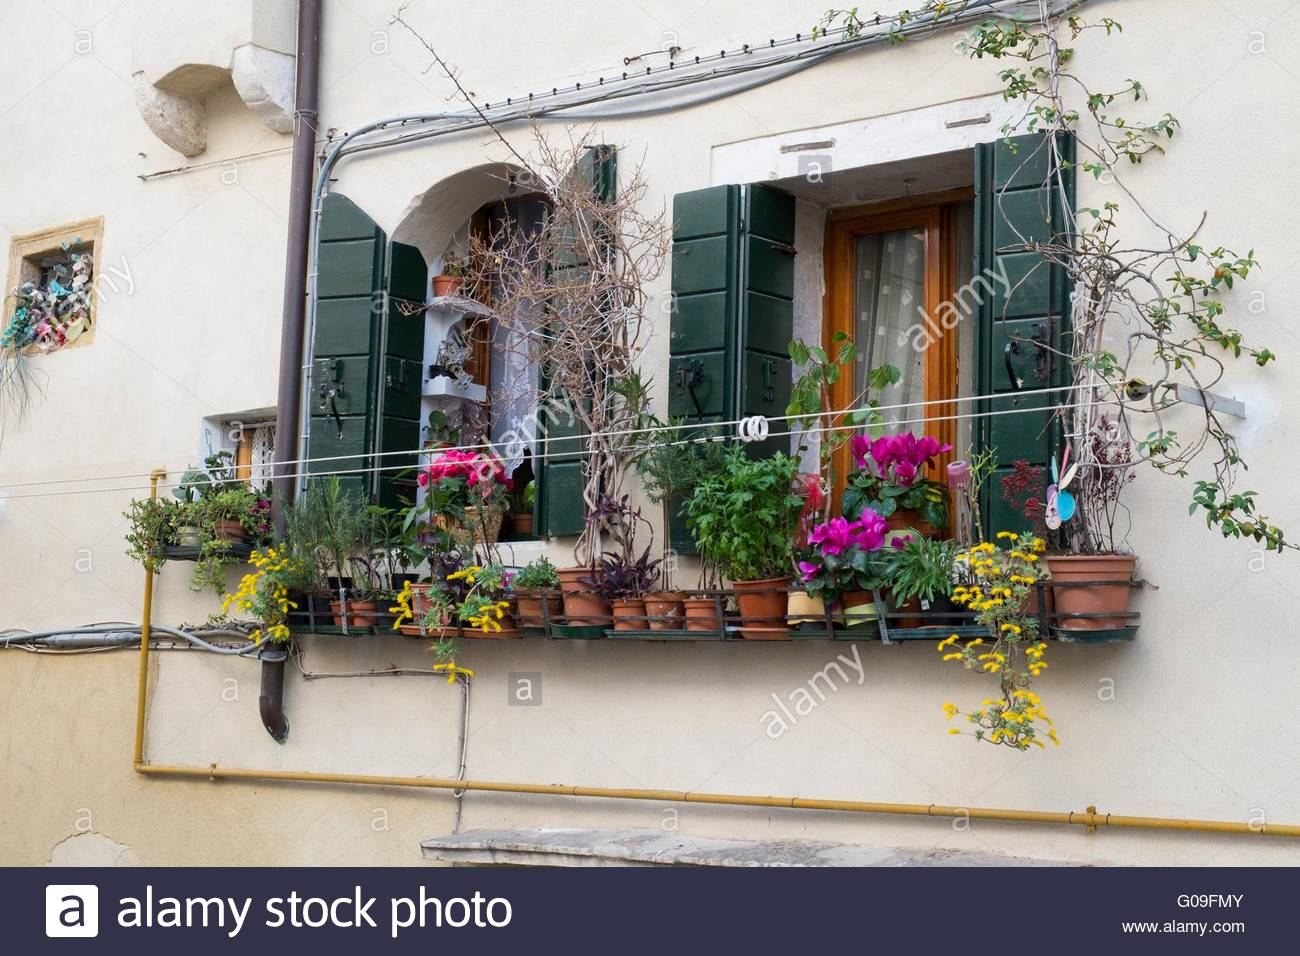 Pots plants adorning a window box Venice, Italy, April - Stock Image